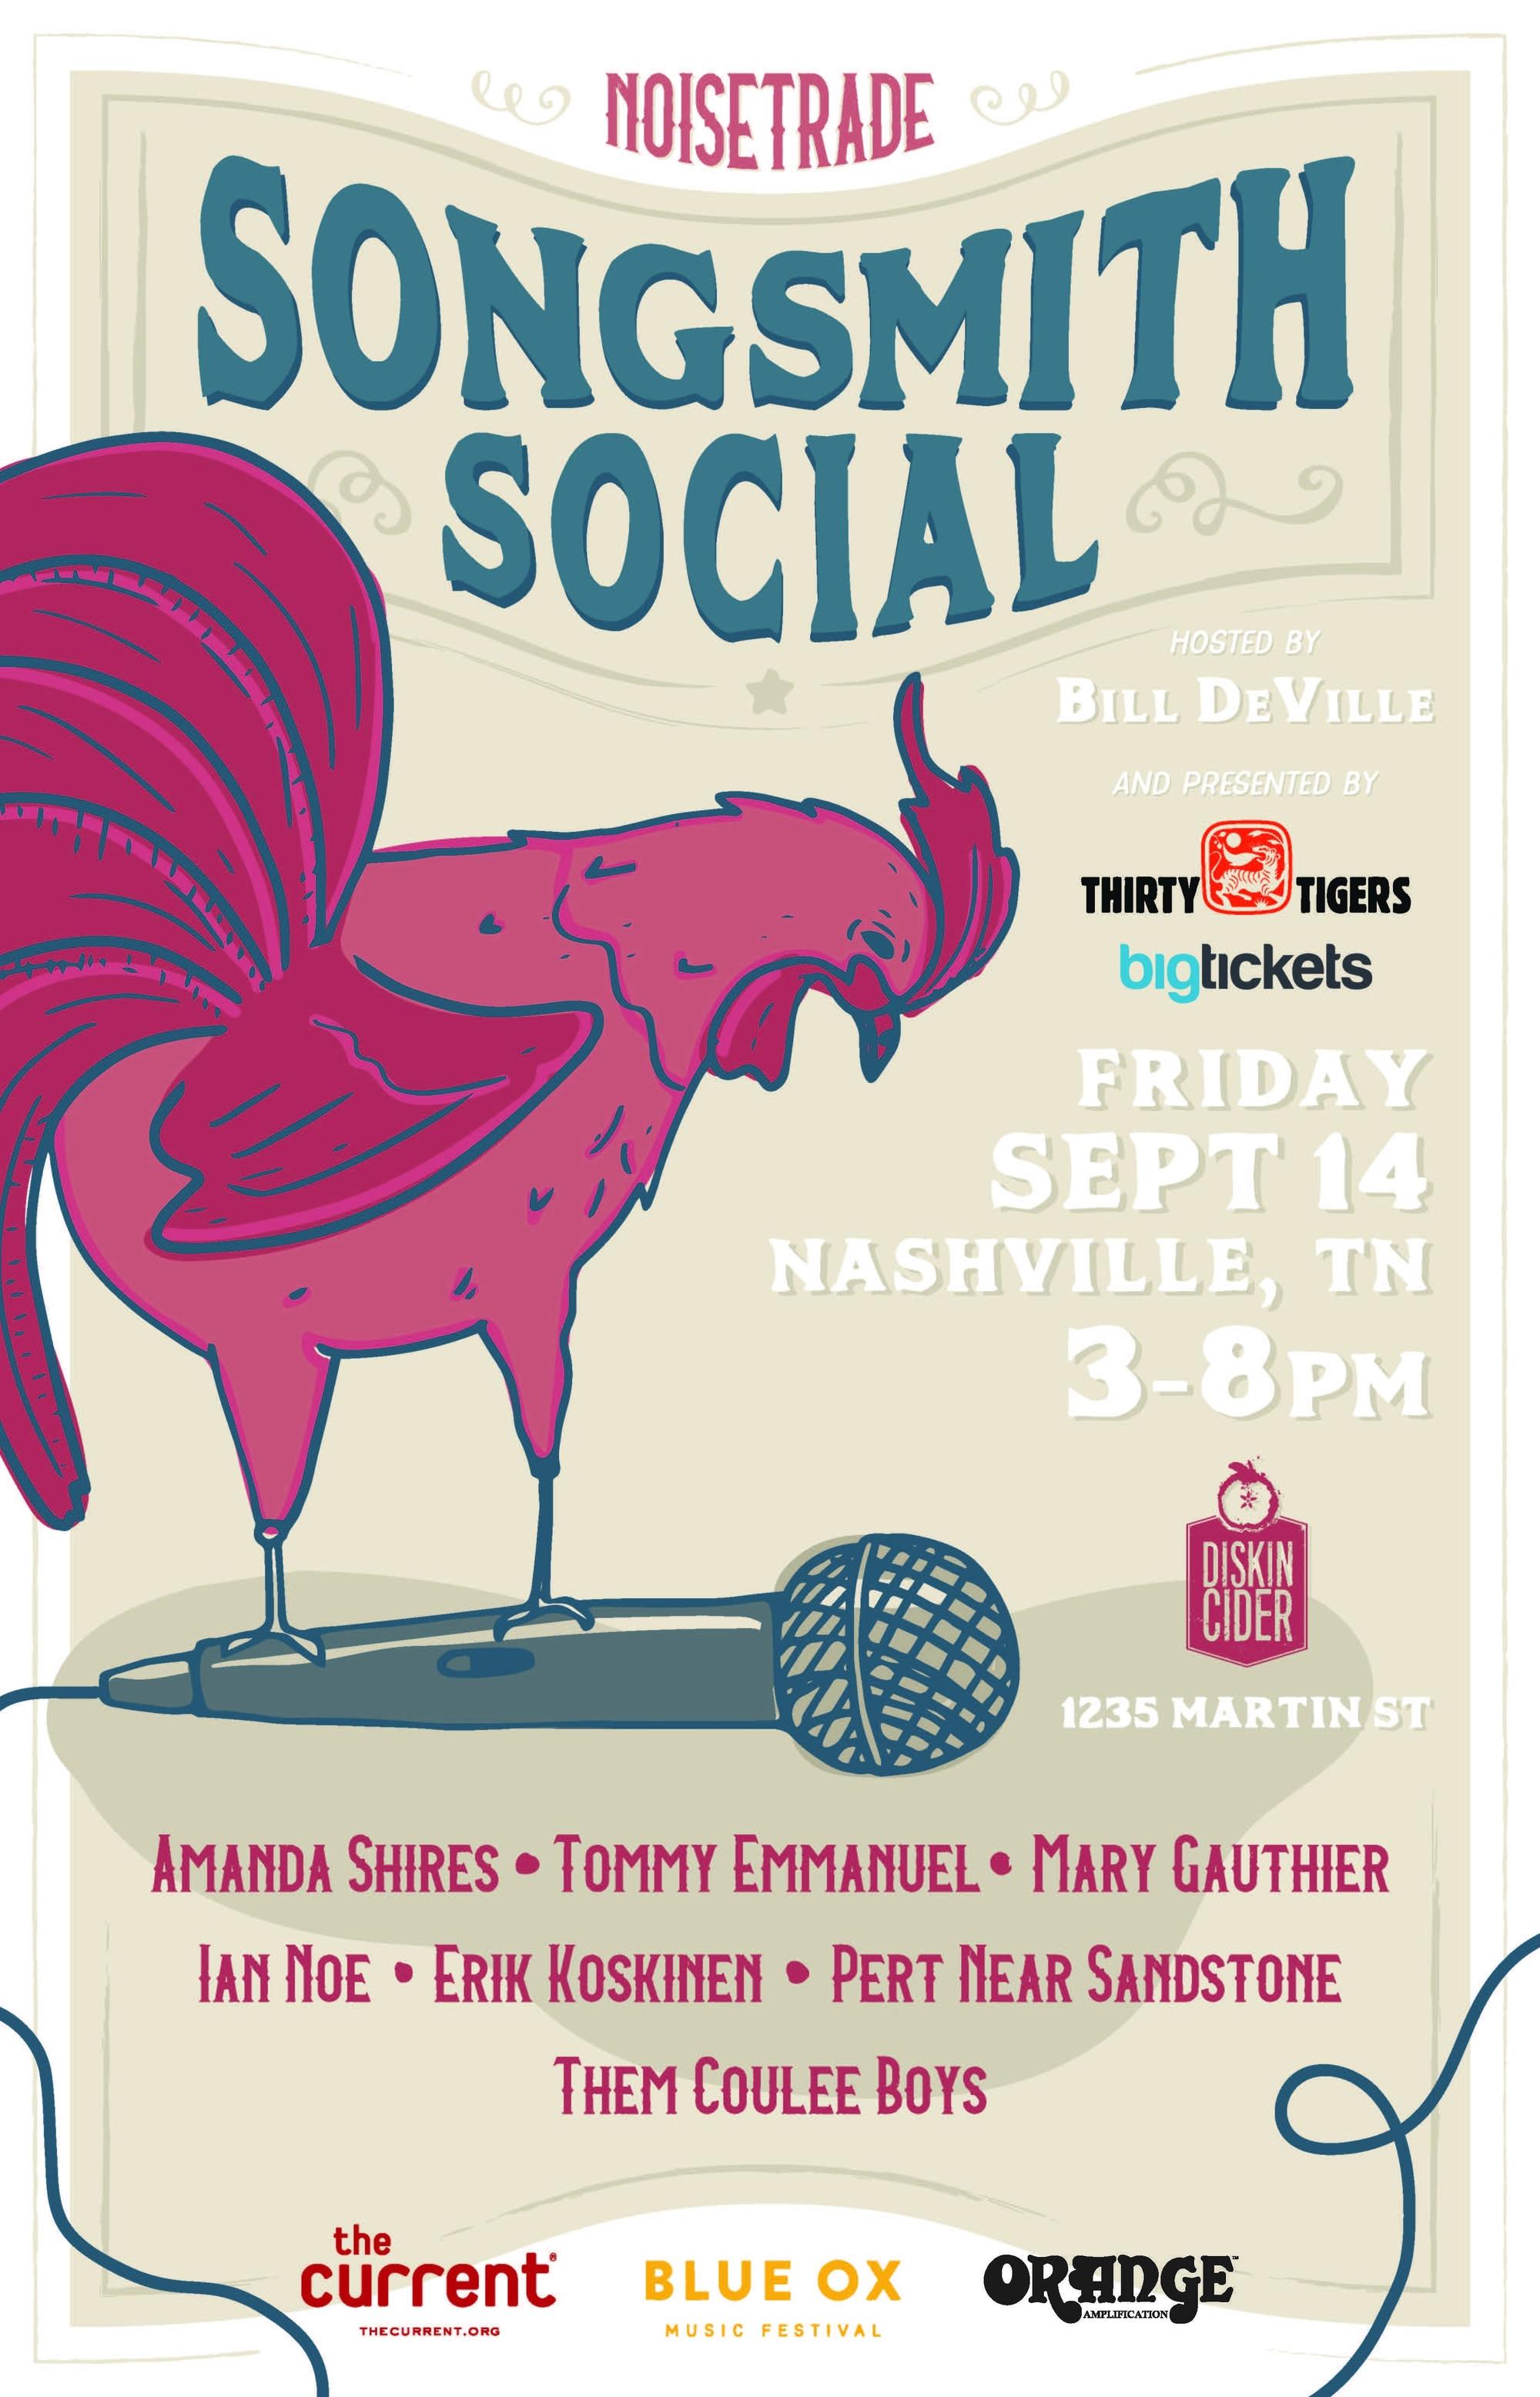 Songsmith Social in Nashville